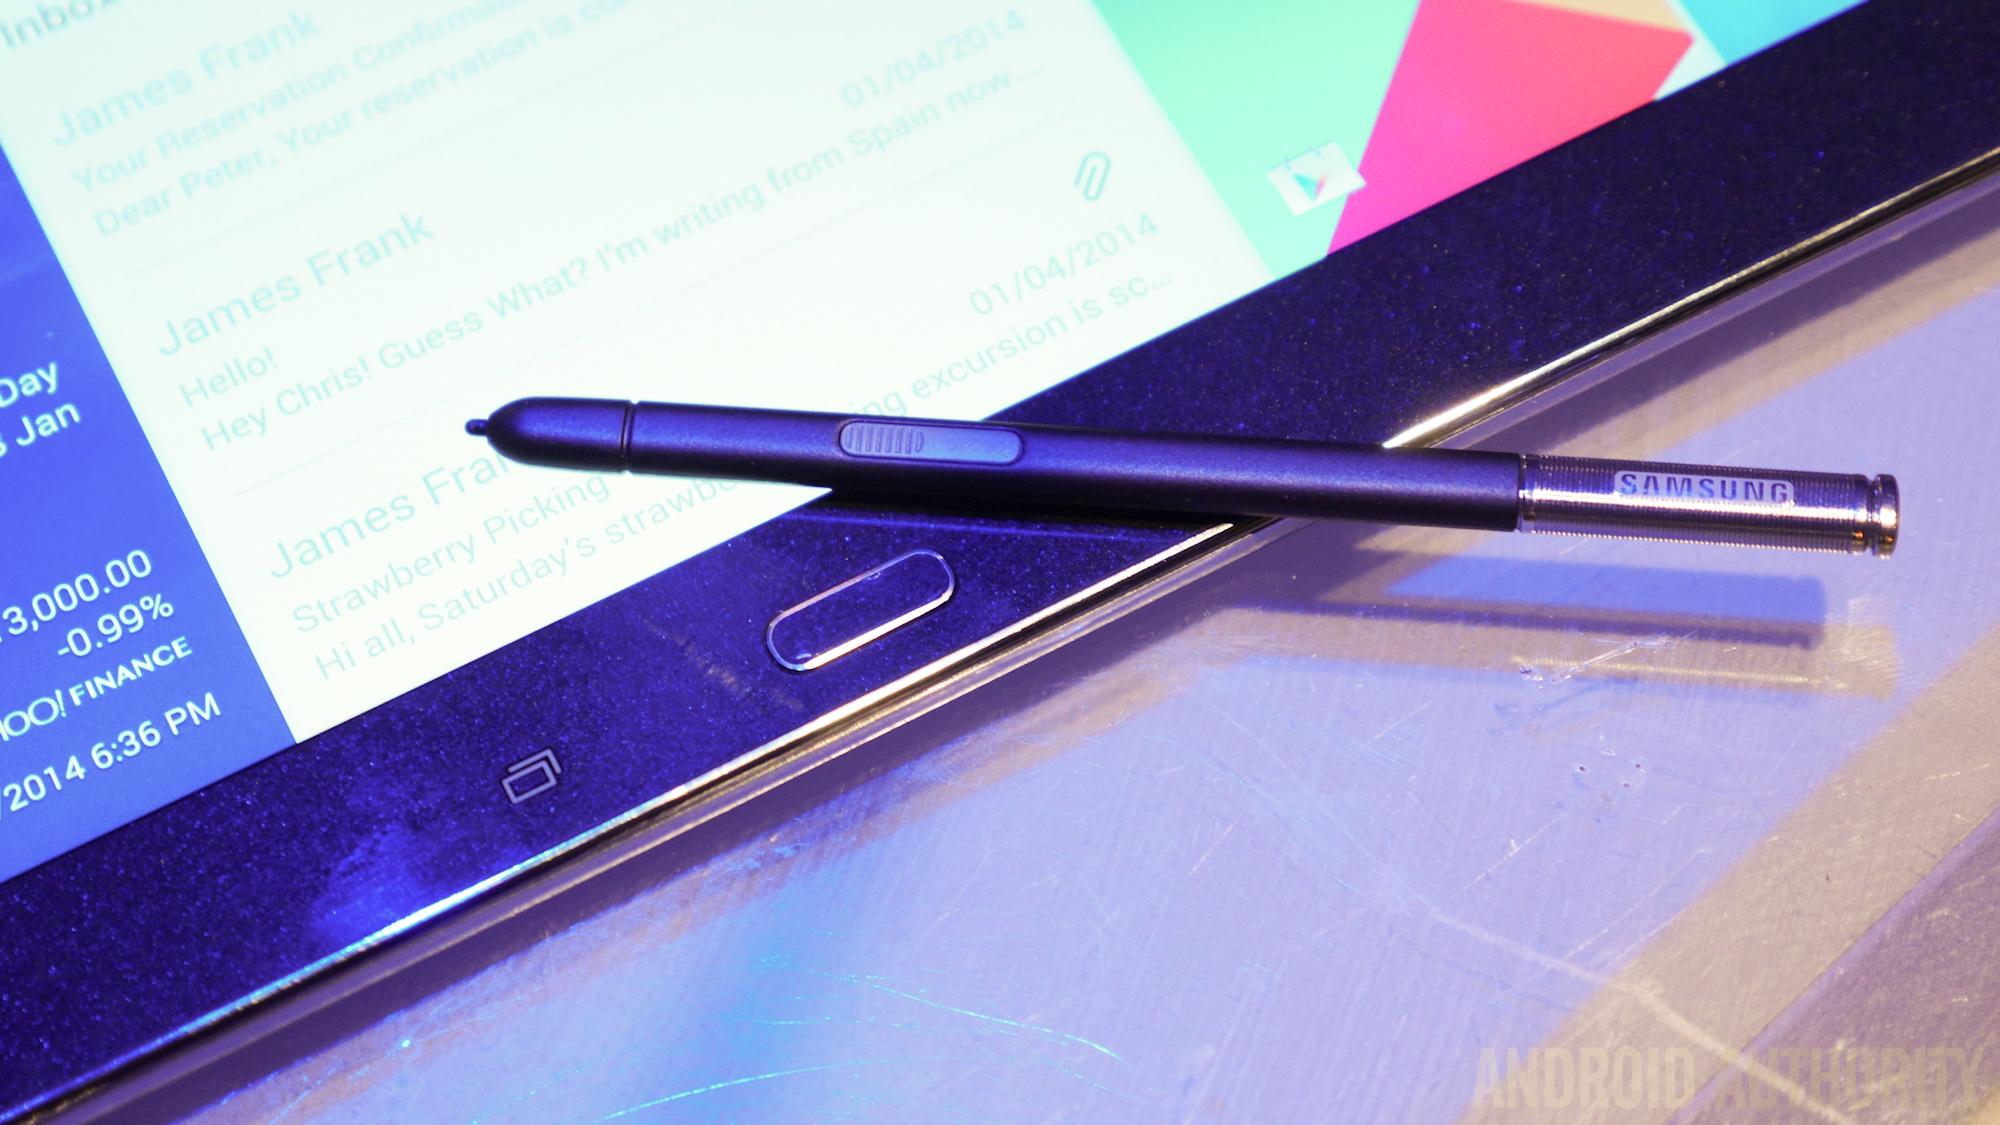 Galaxy NotePRO 12.2